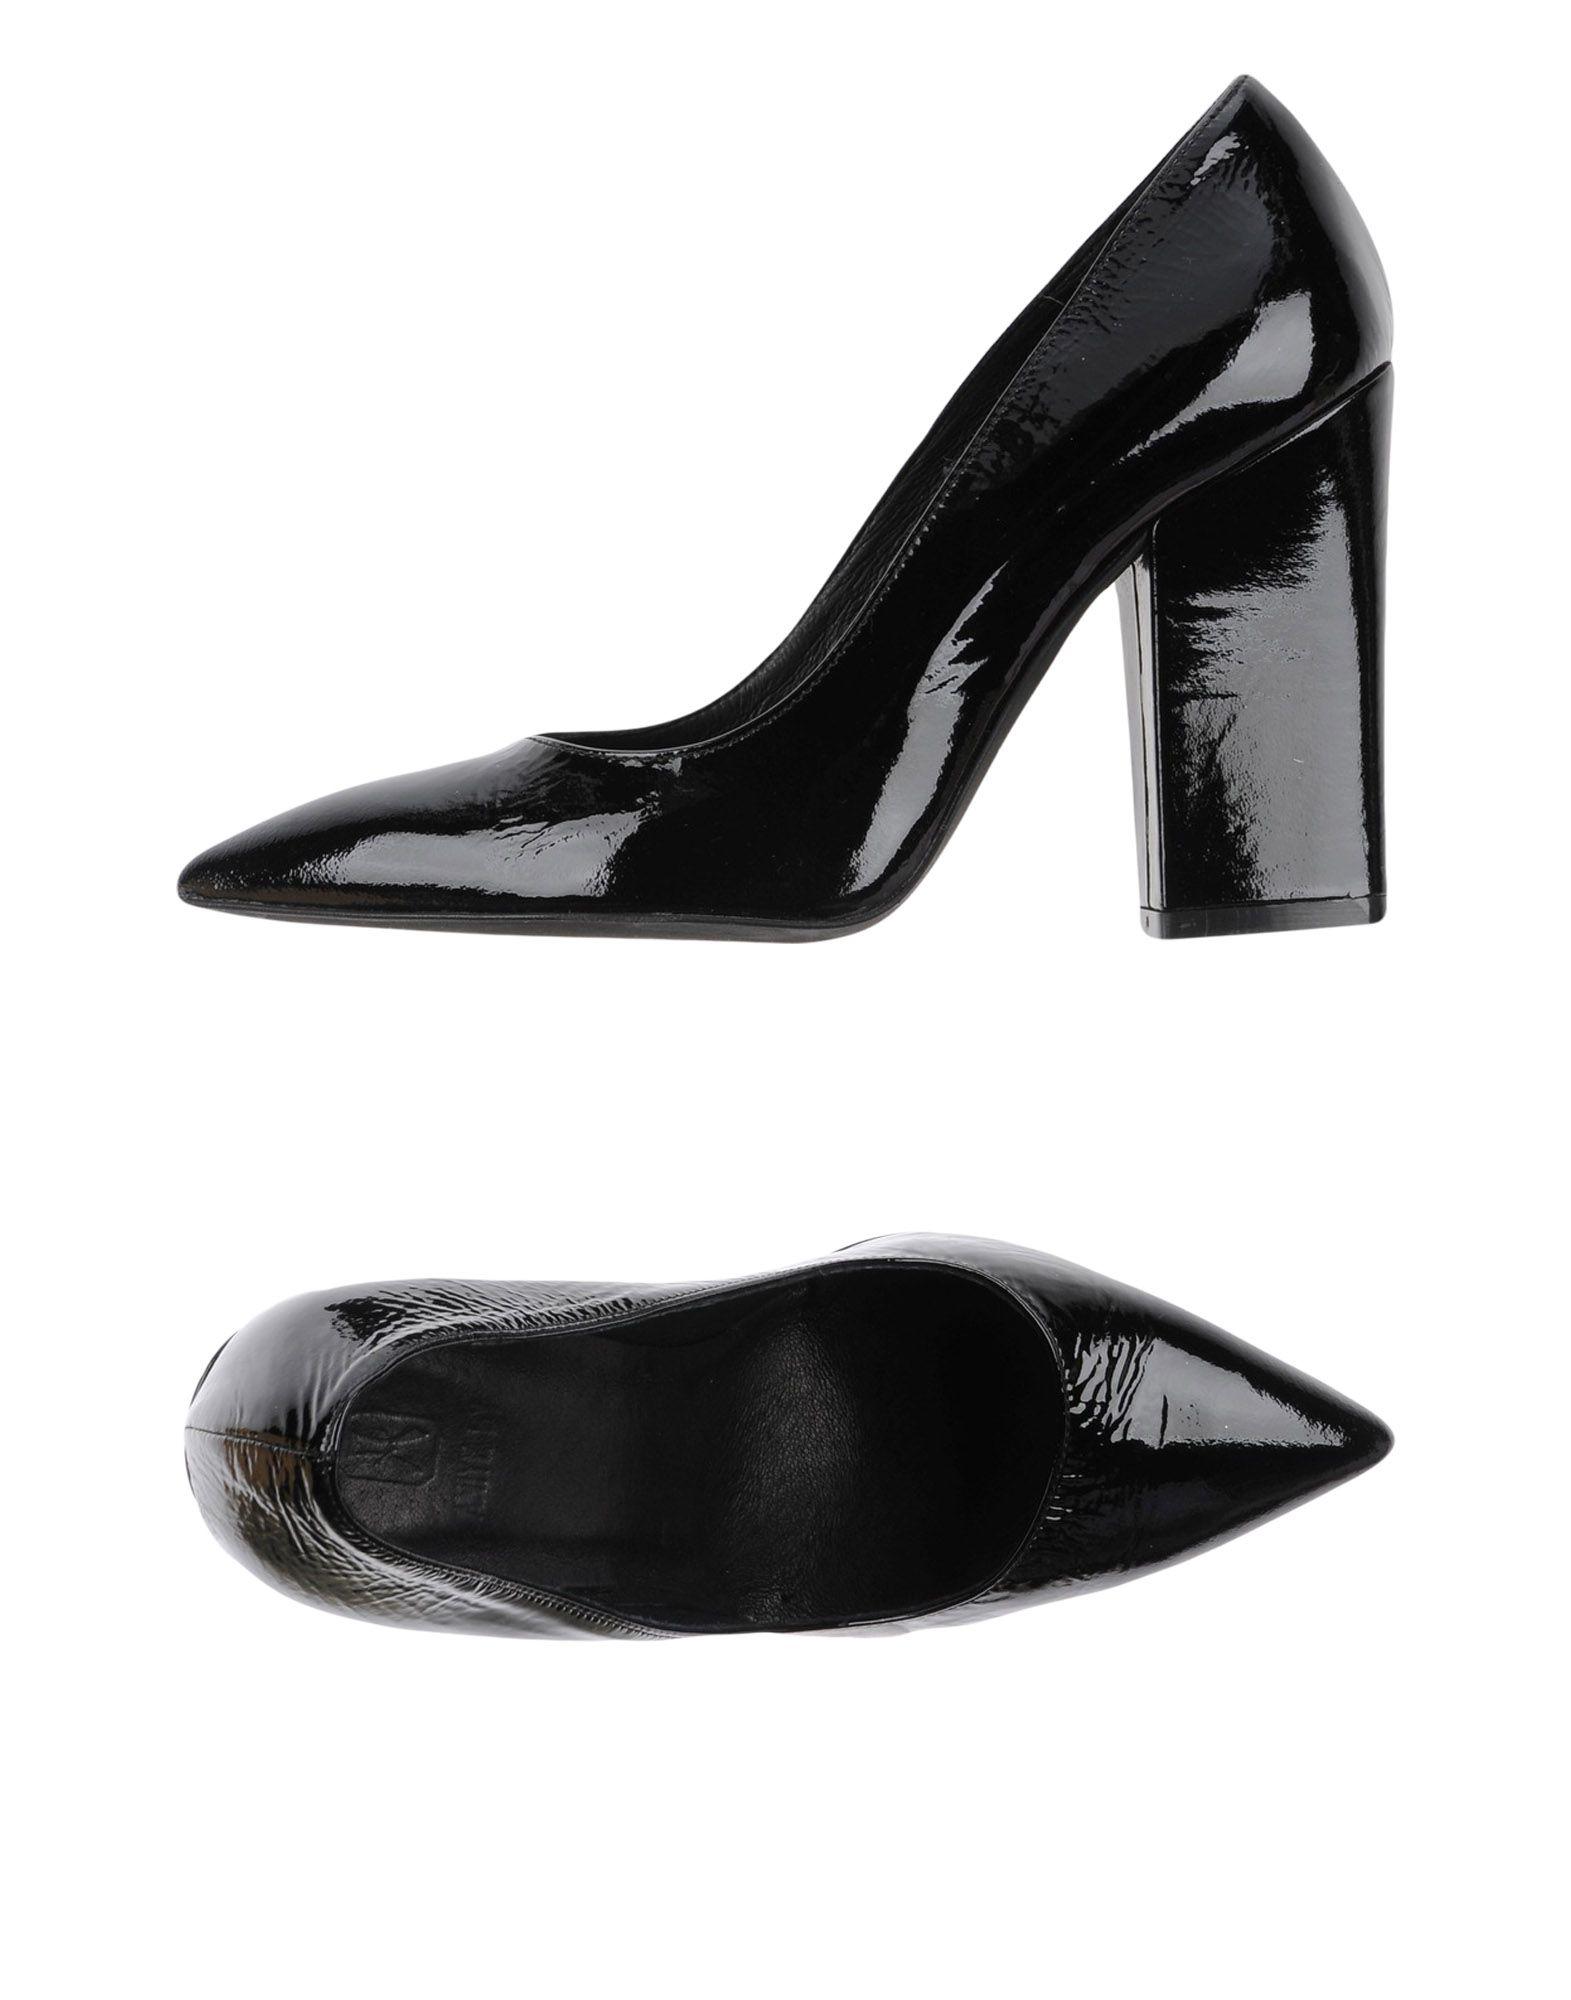 Aniye By Pumps Damen  11261703JK Gute Qualität beliebte Schuhe